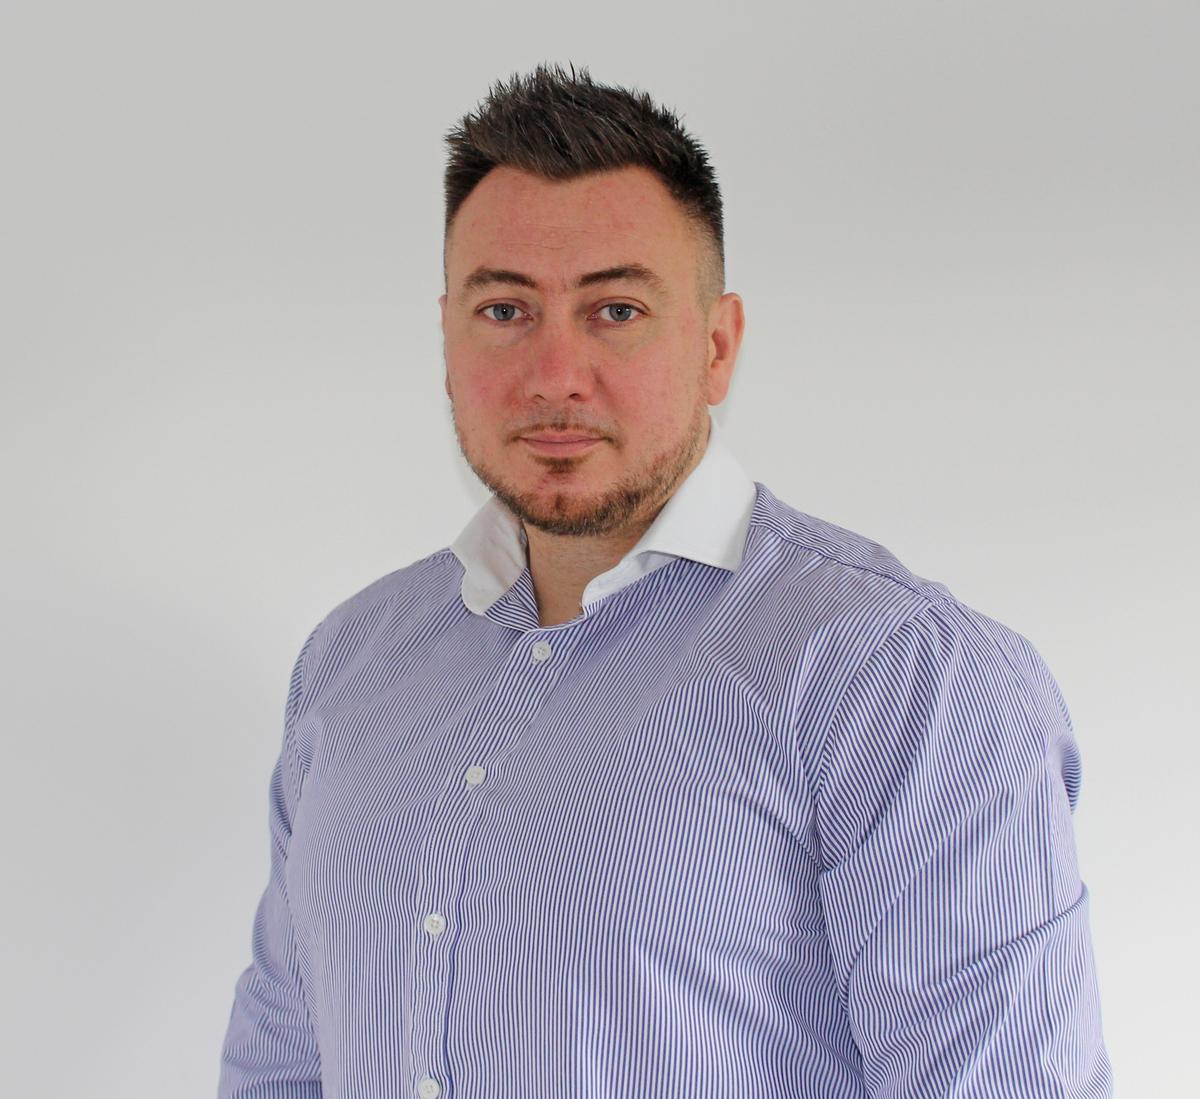 Rees first joined Premier Global NASM in September 2019 as commercial director / Premier Global NASM